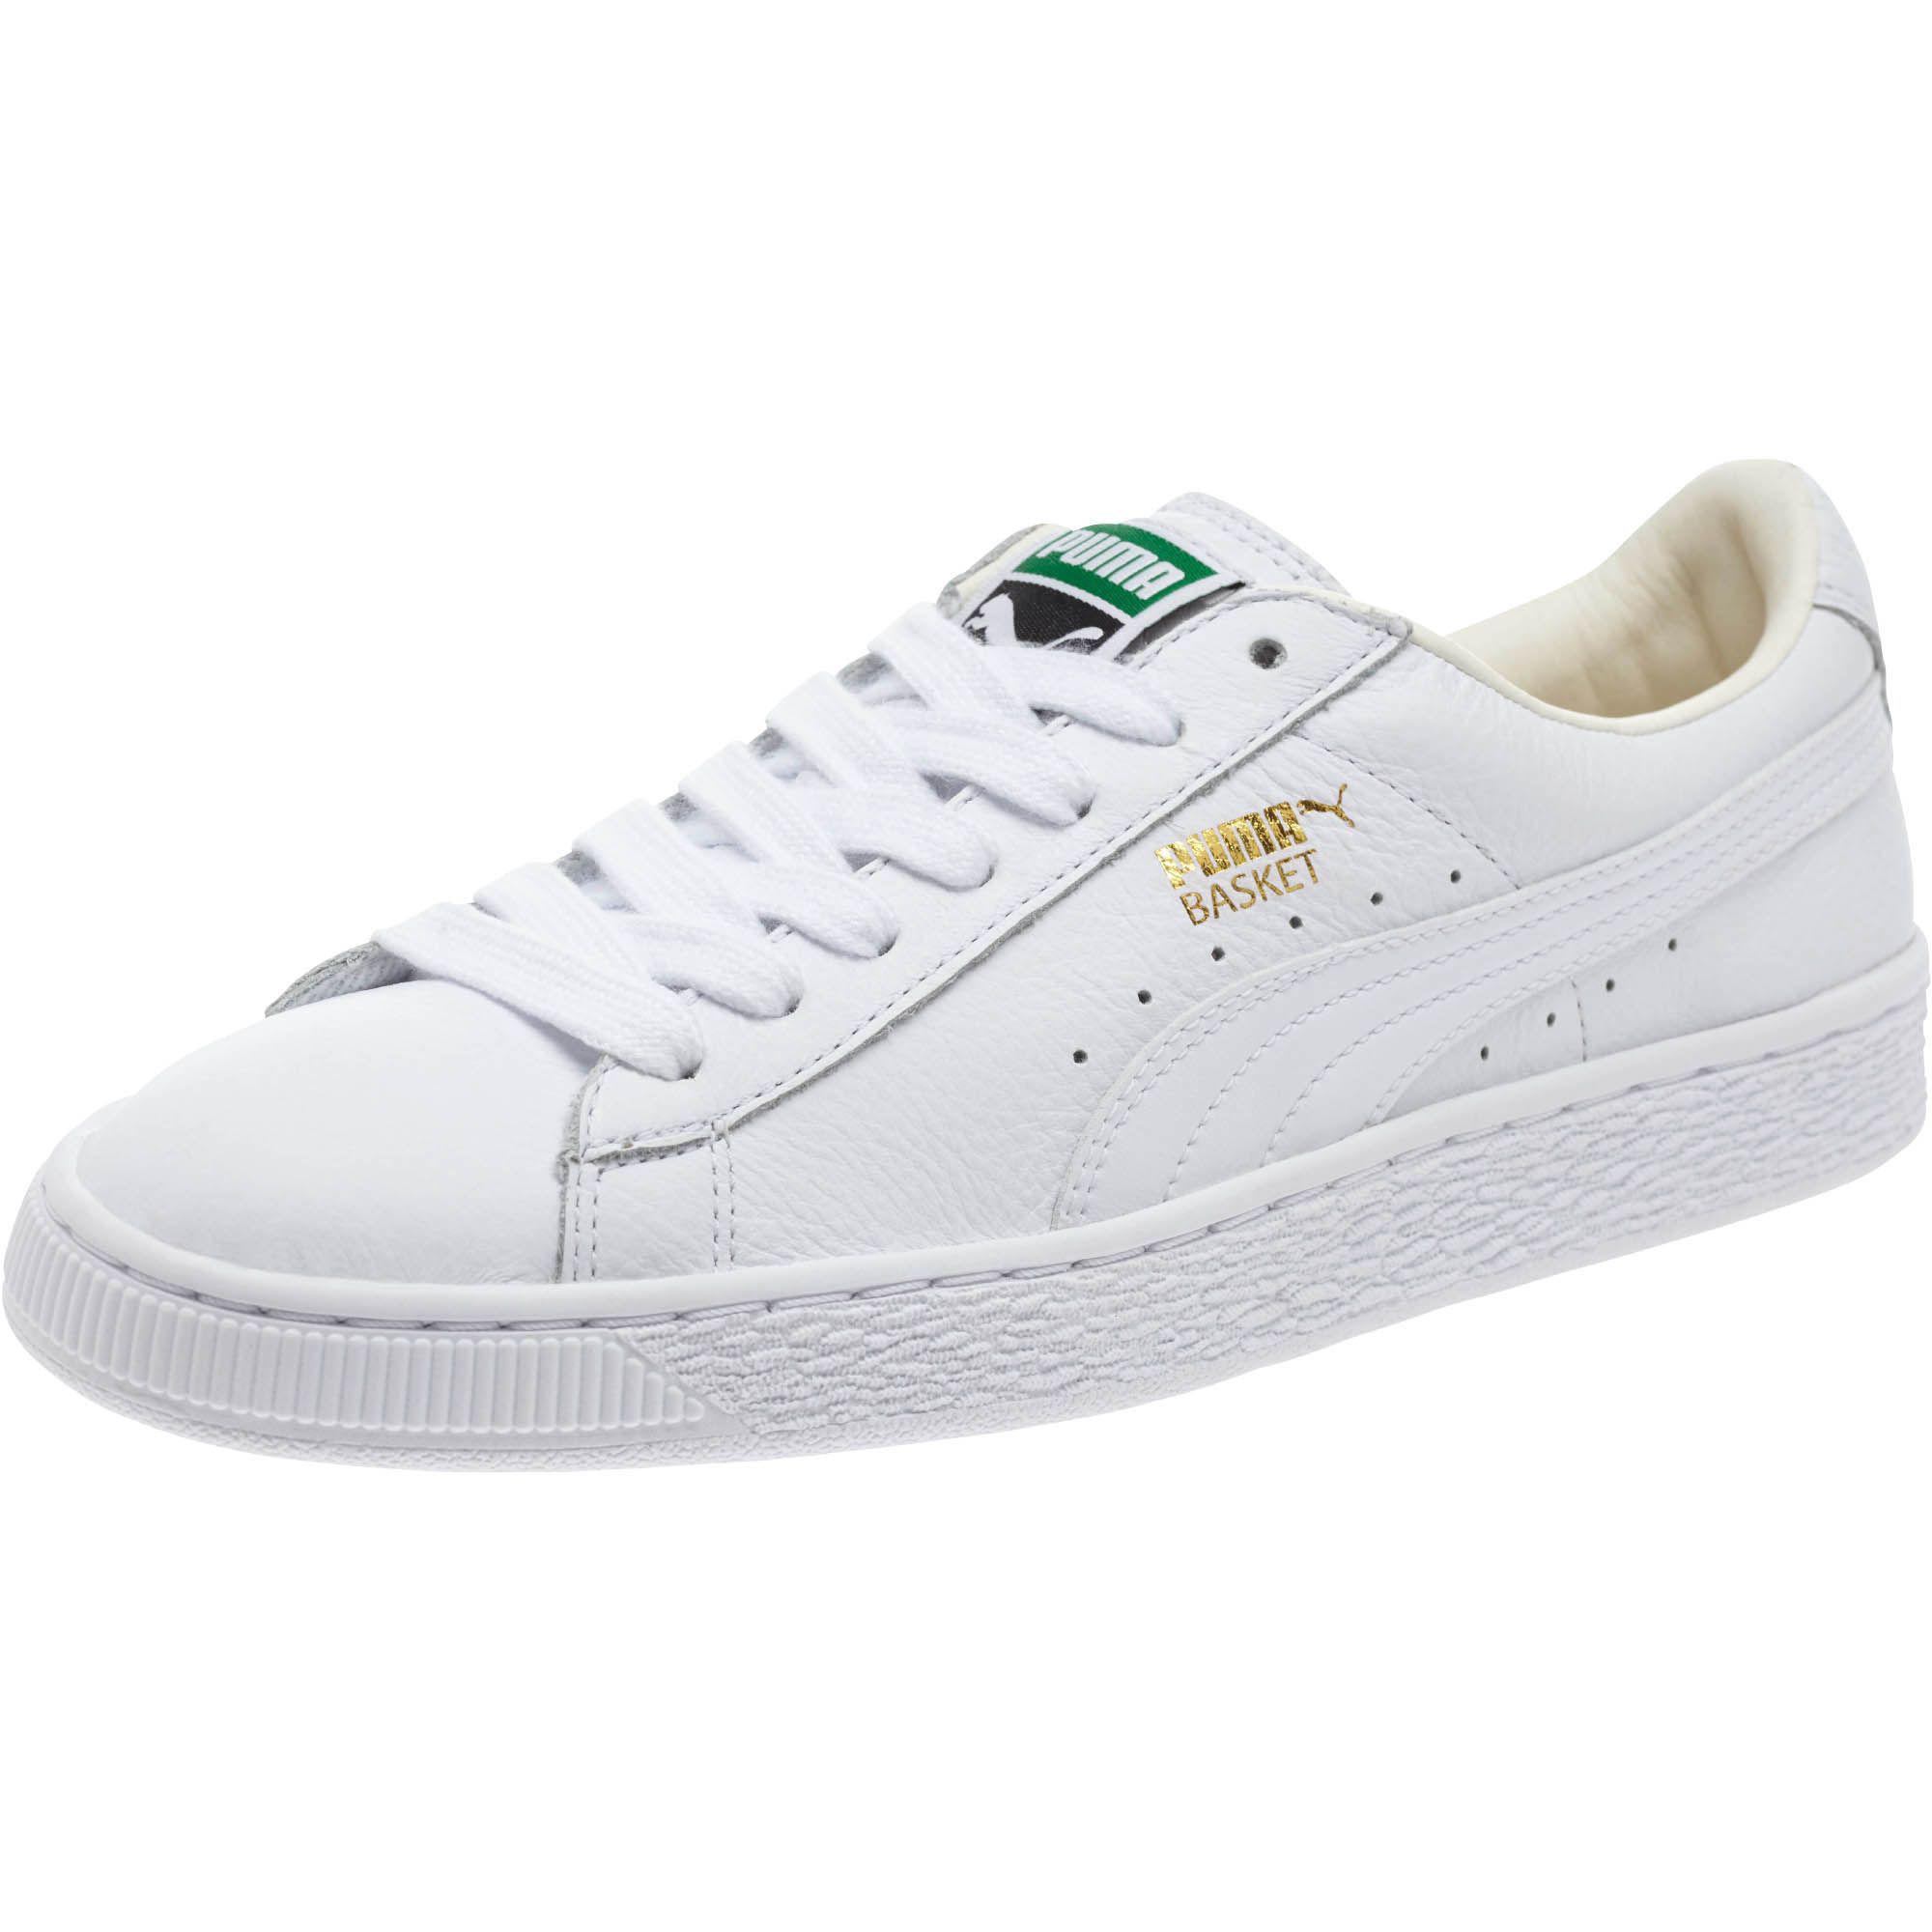 quality design 23c1e f5249 White Basket Classic Lifestyle Women's Sneakers